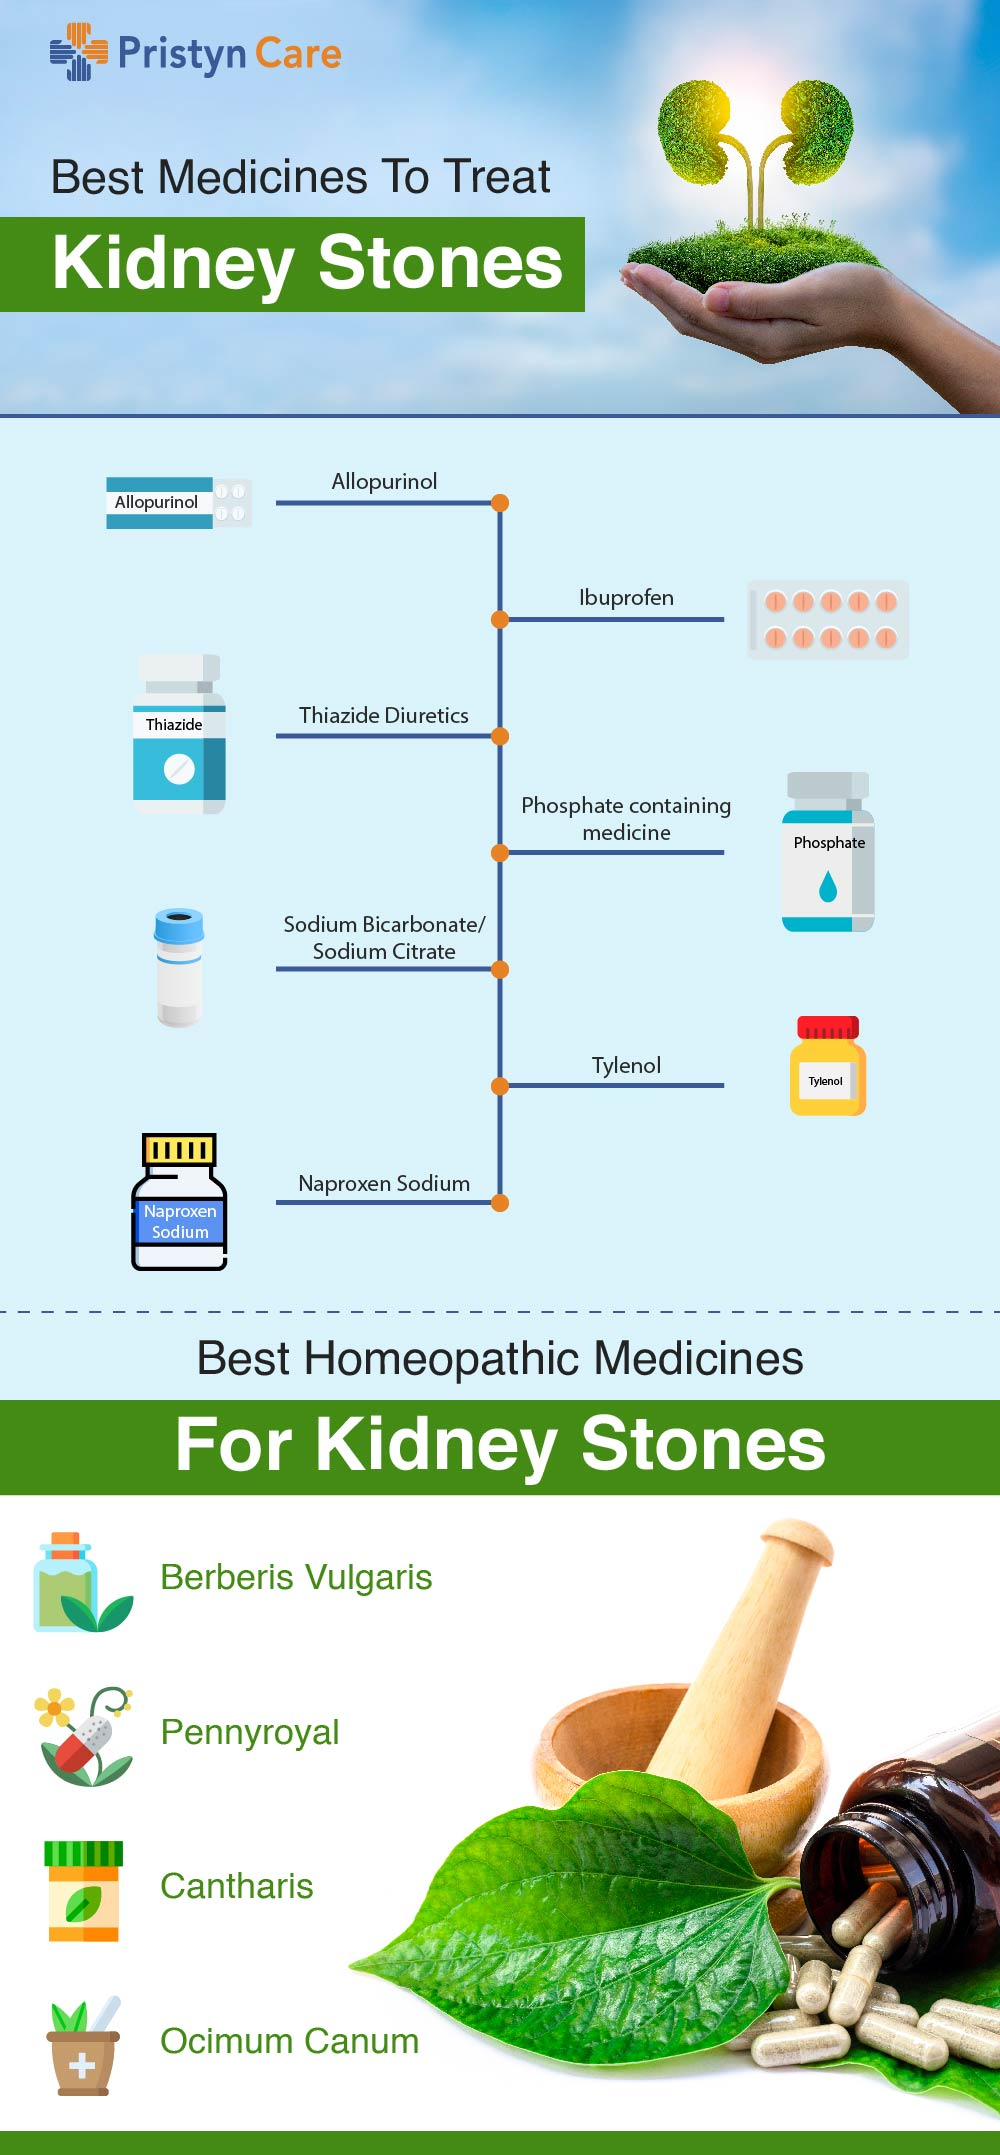 Top Medicines To Treat Kidney Stones infographic